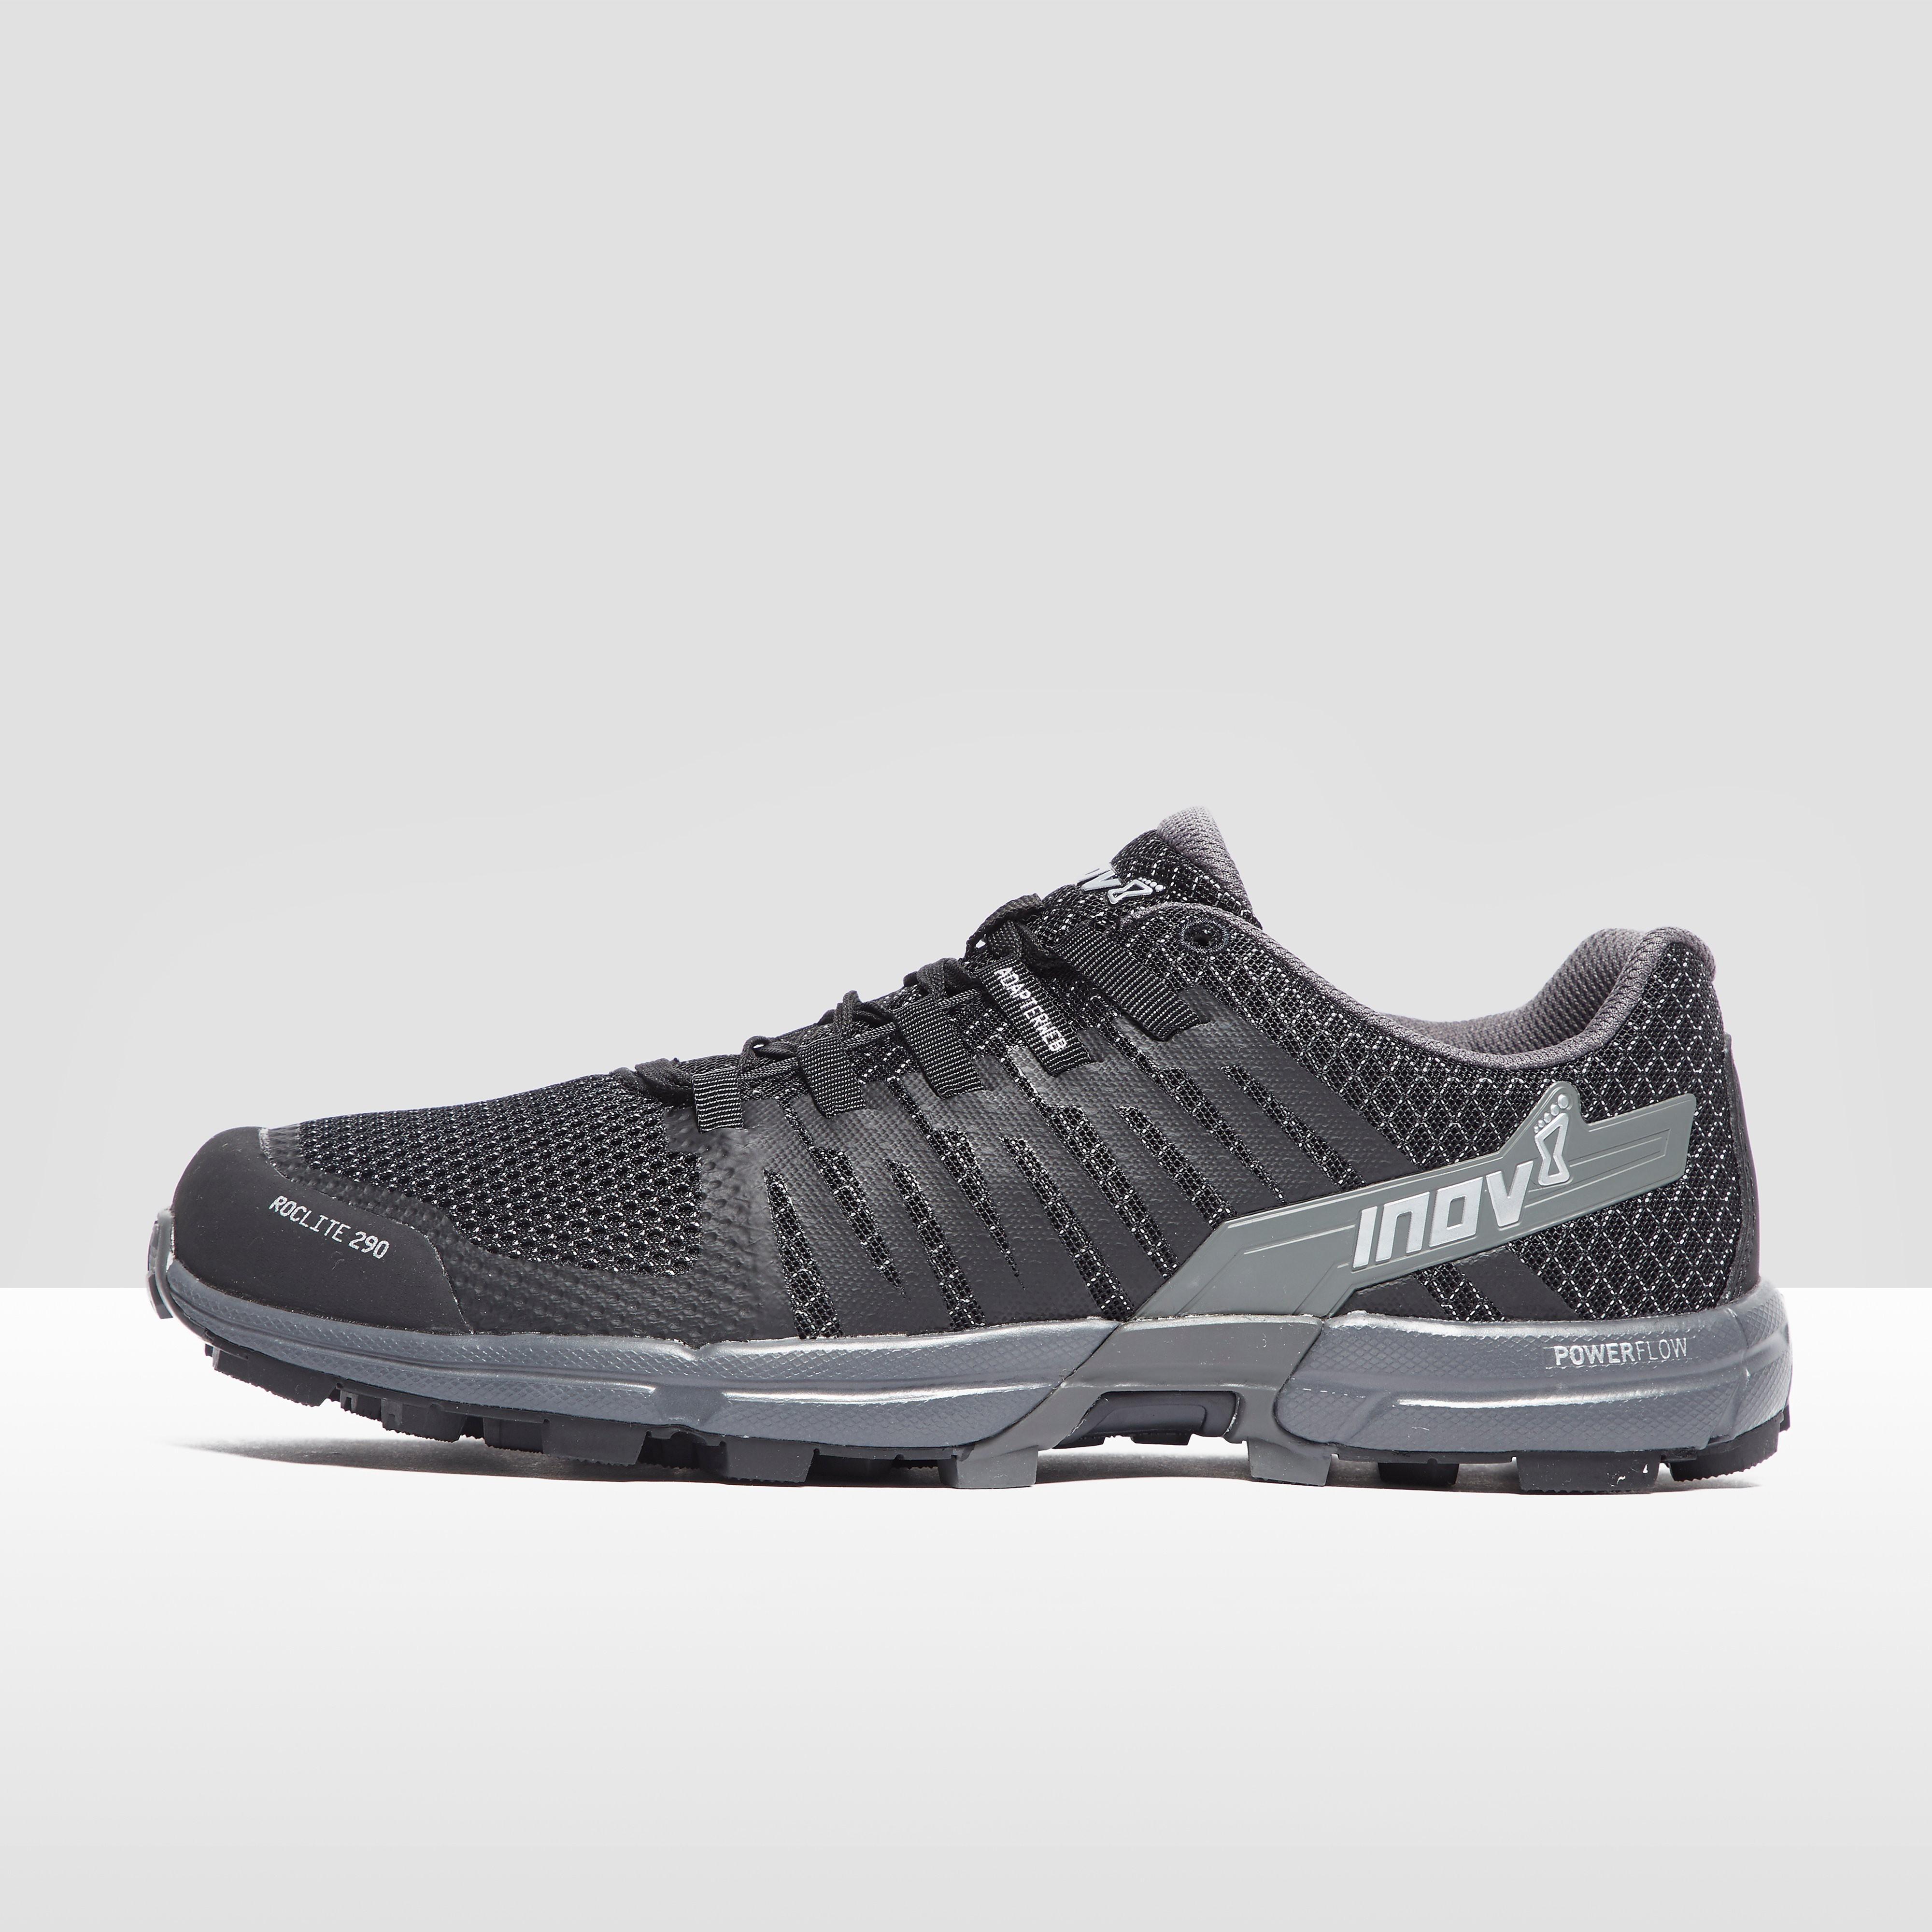 Inov-8 Roclite 290 Men's Running Shoes